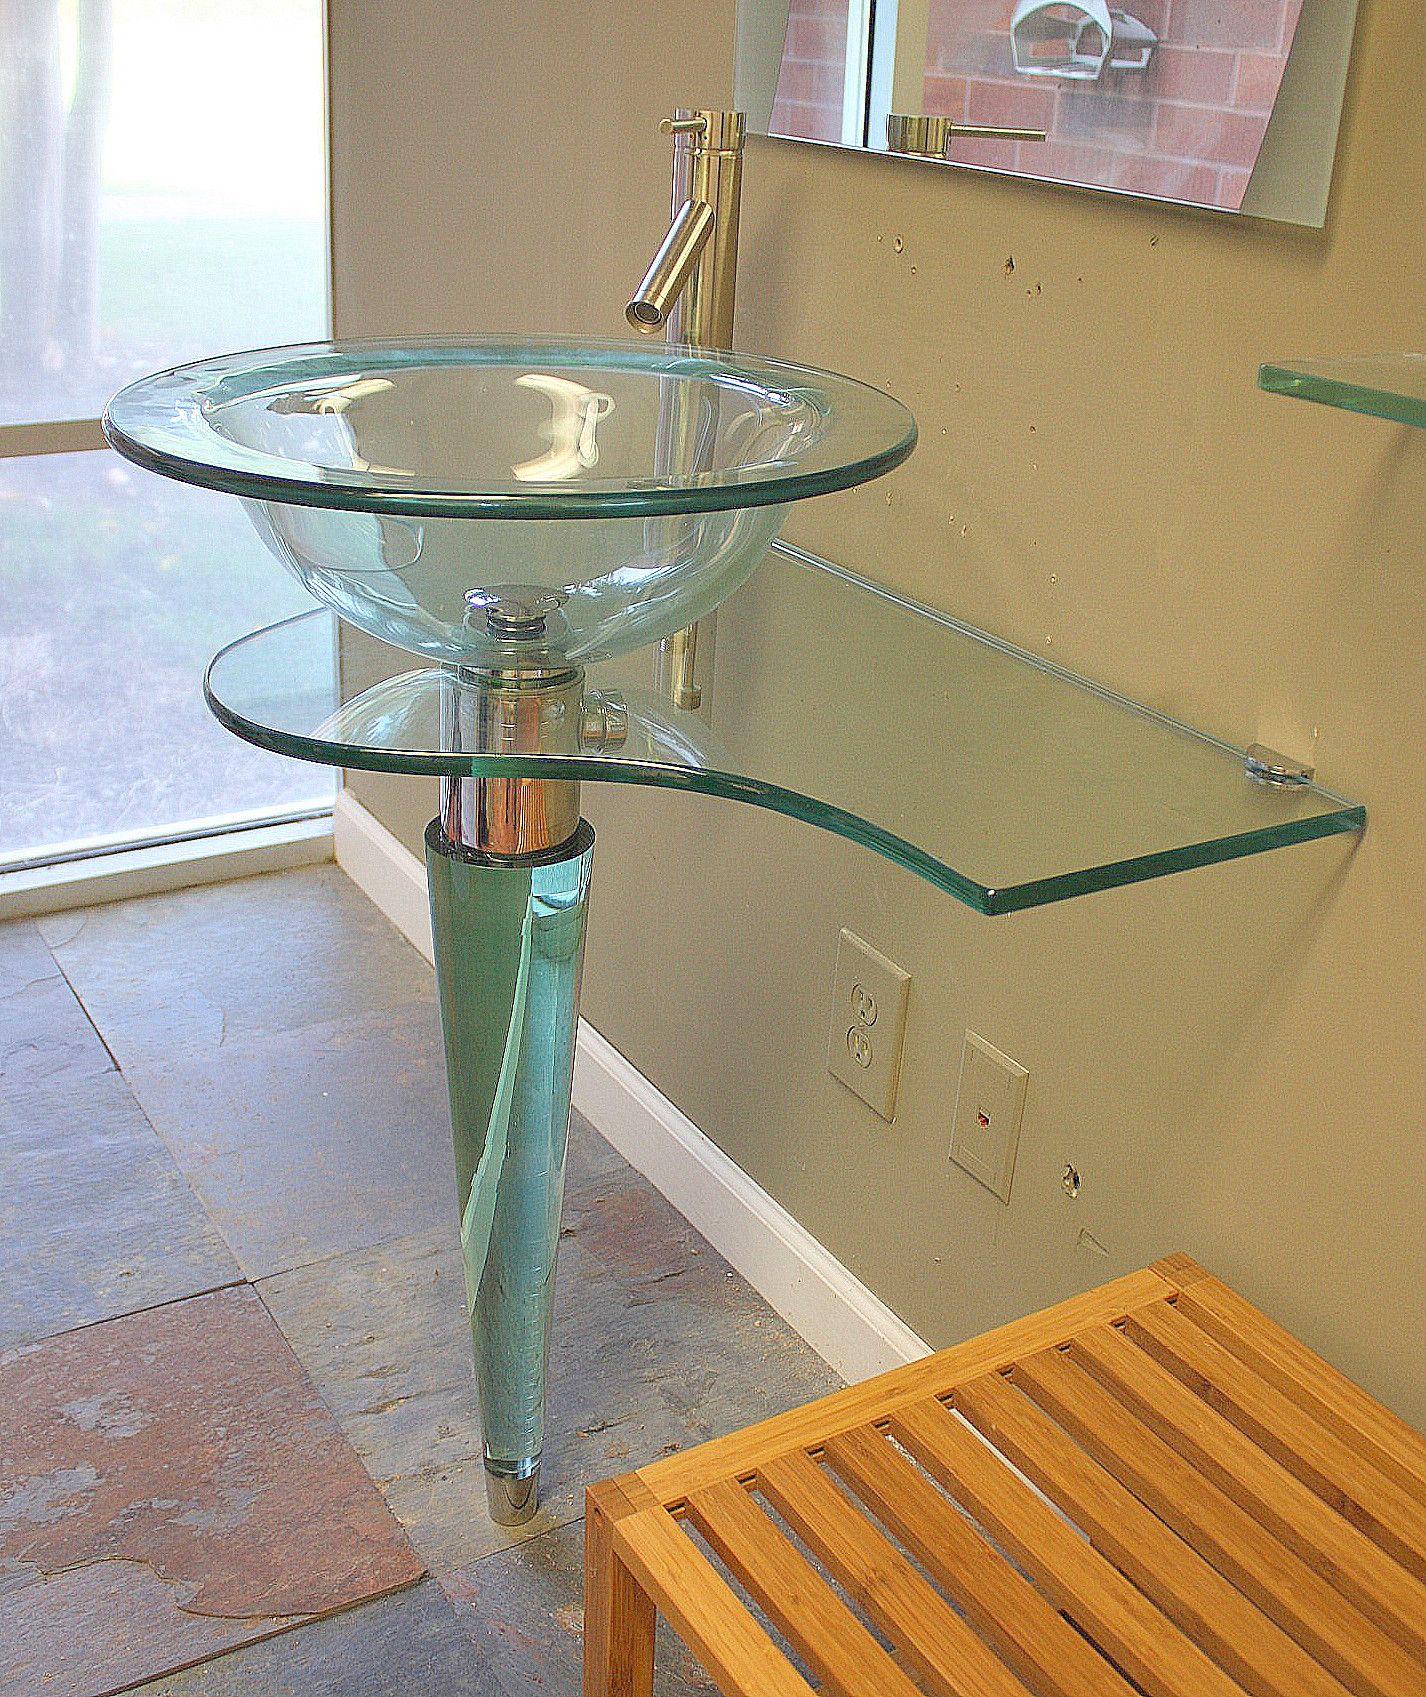 31 5 In Wide All Glass Contemporary Modern Bathroom Glass Vessel